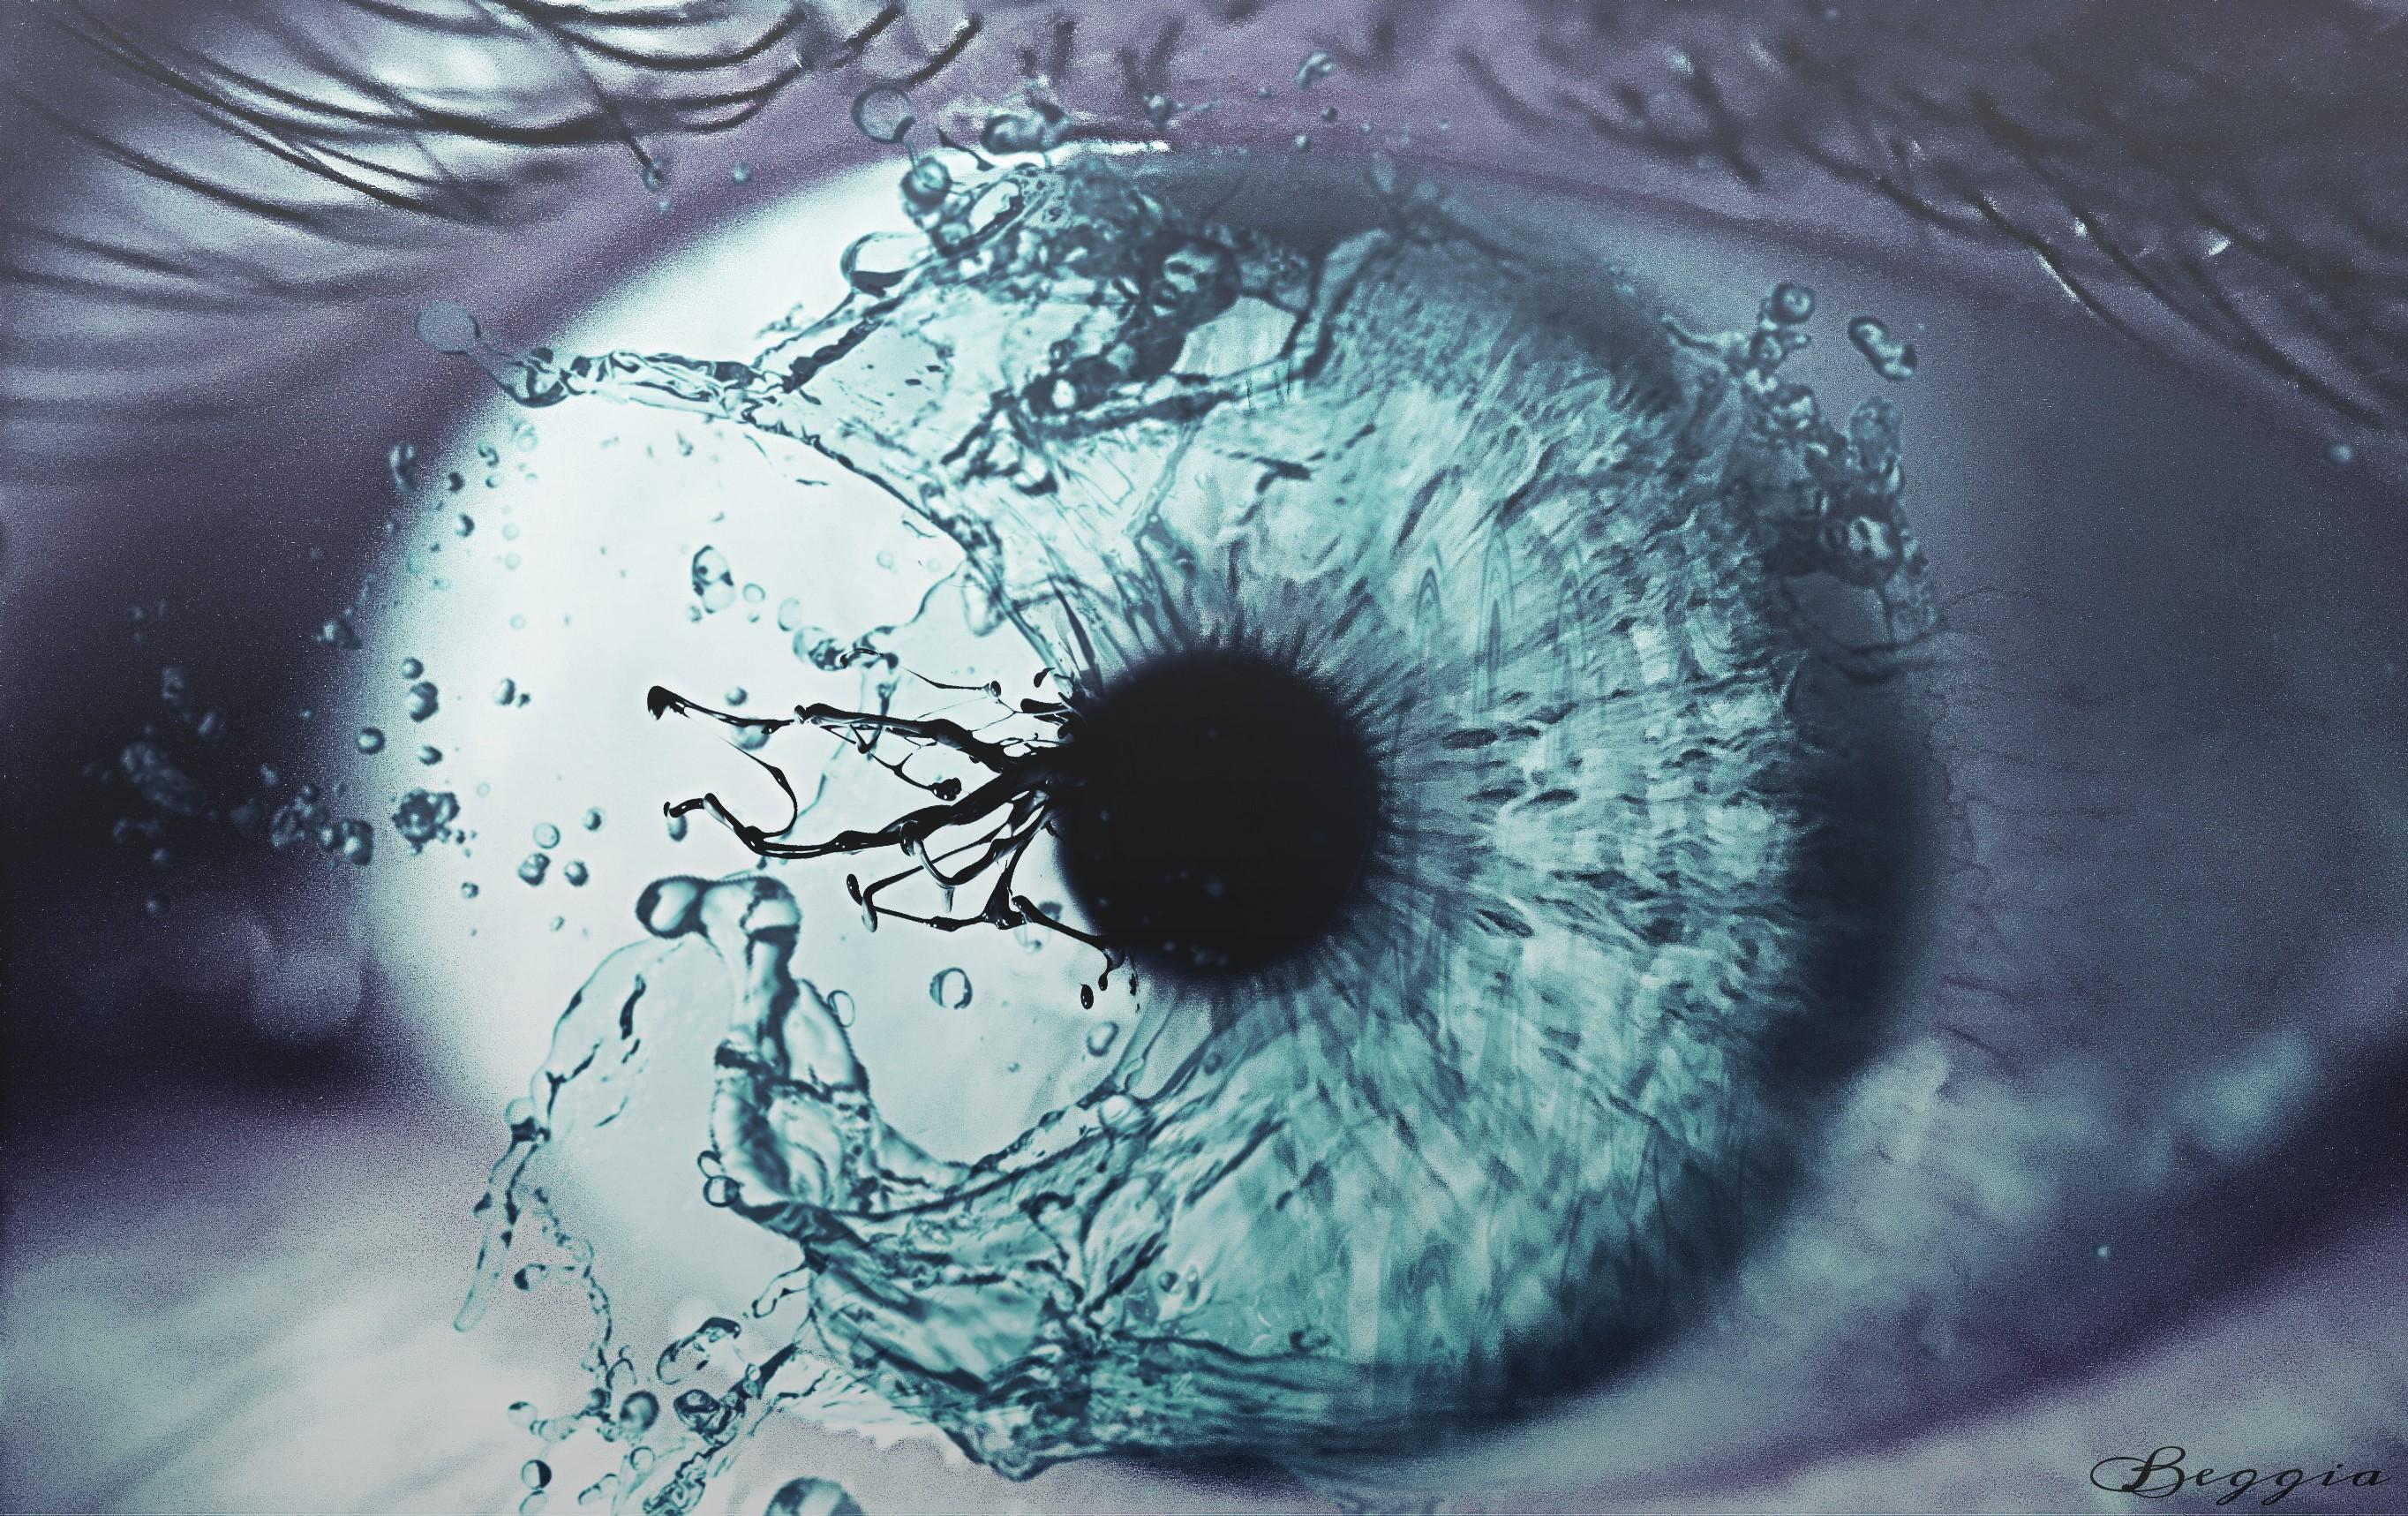 Good Anime Wallpaper By Beggia Water Splash Eye My Friend S Eye Good Morn